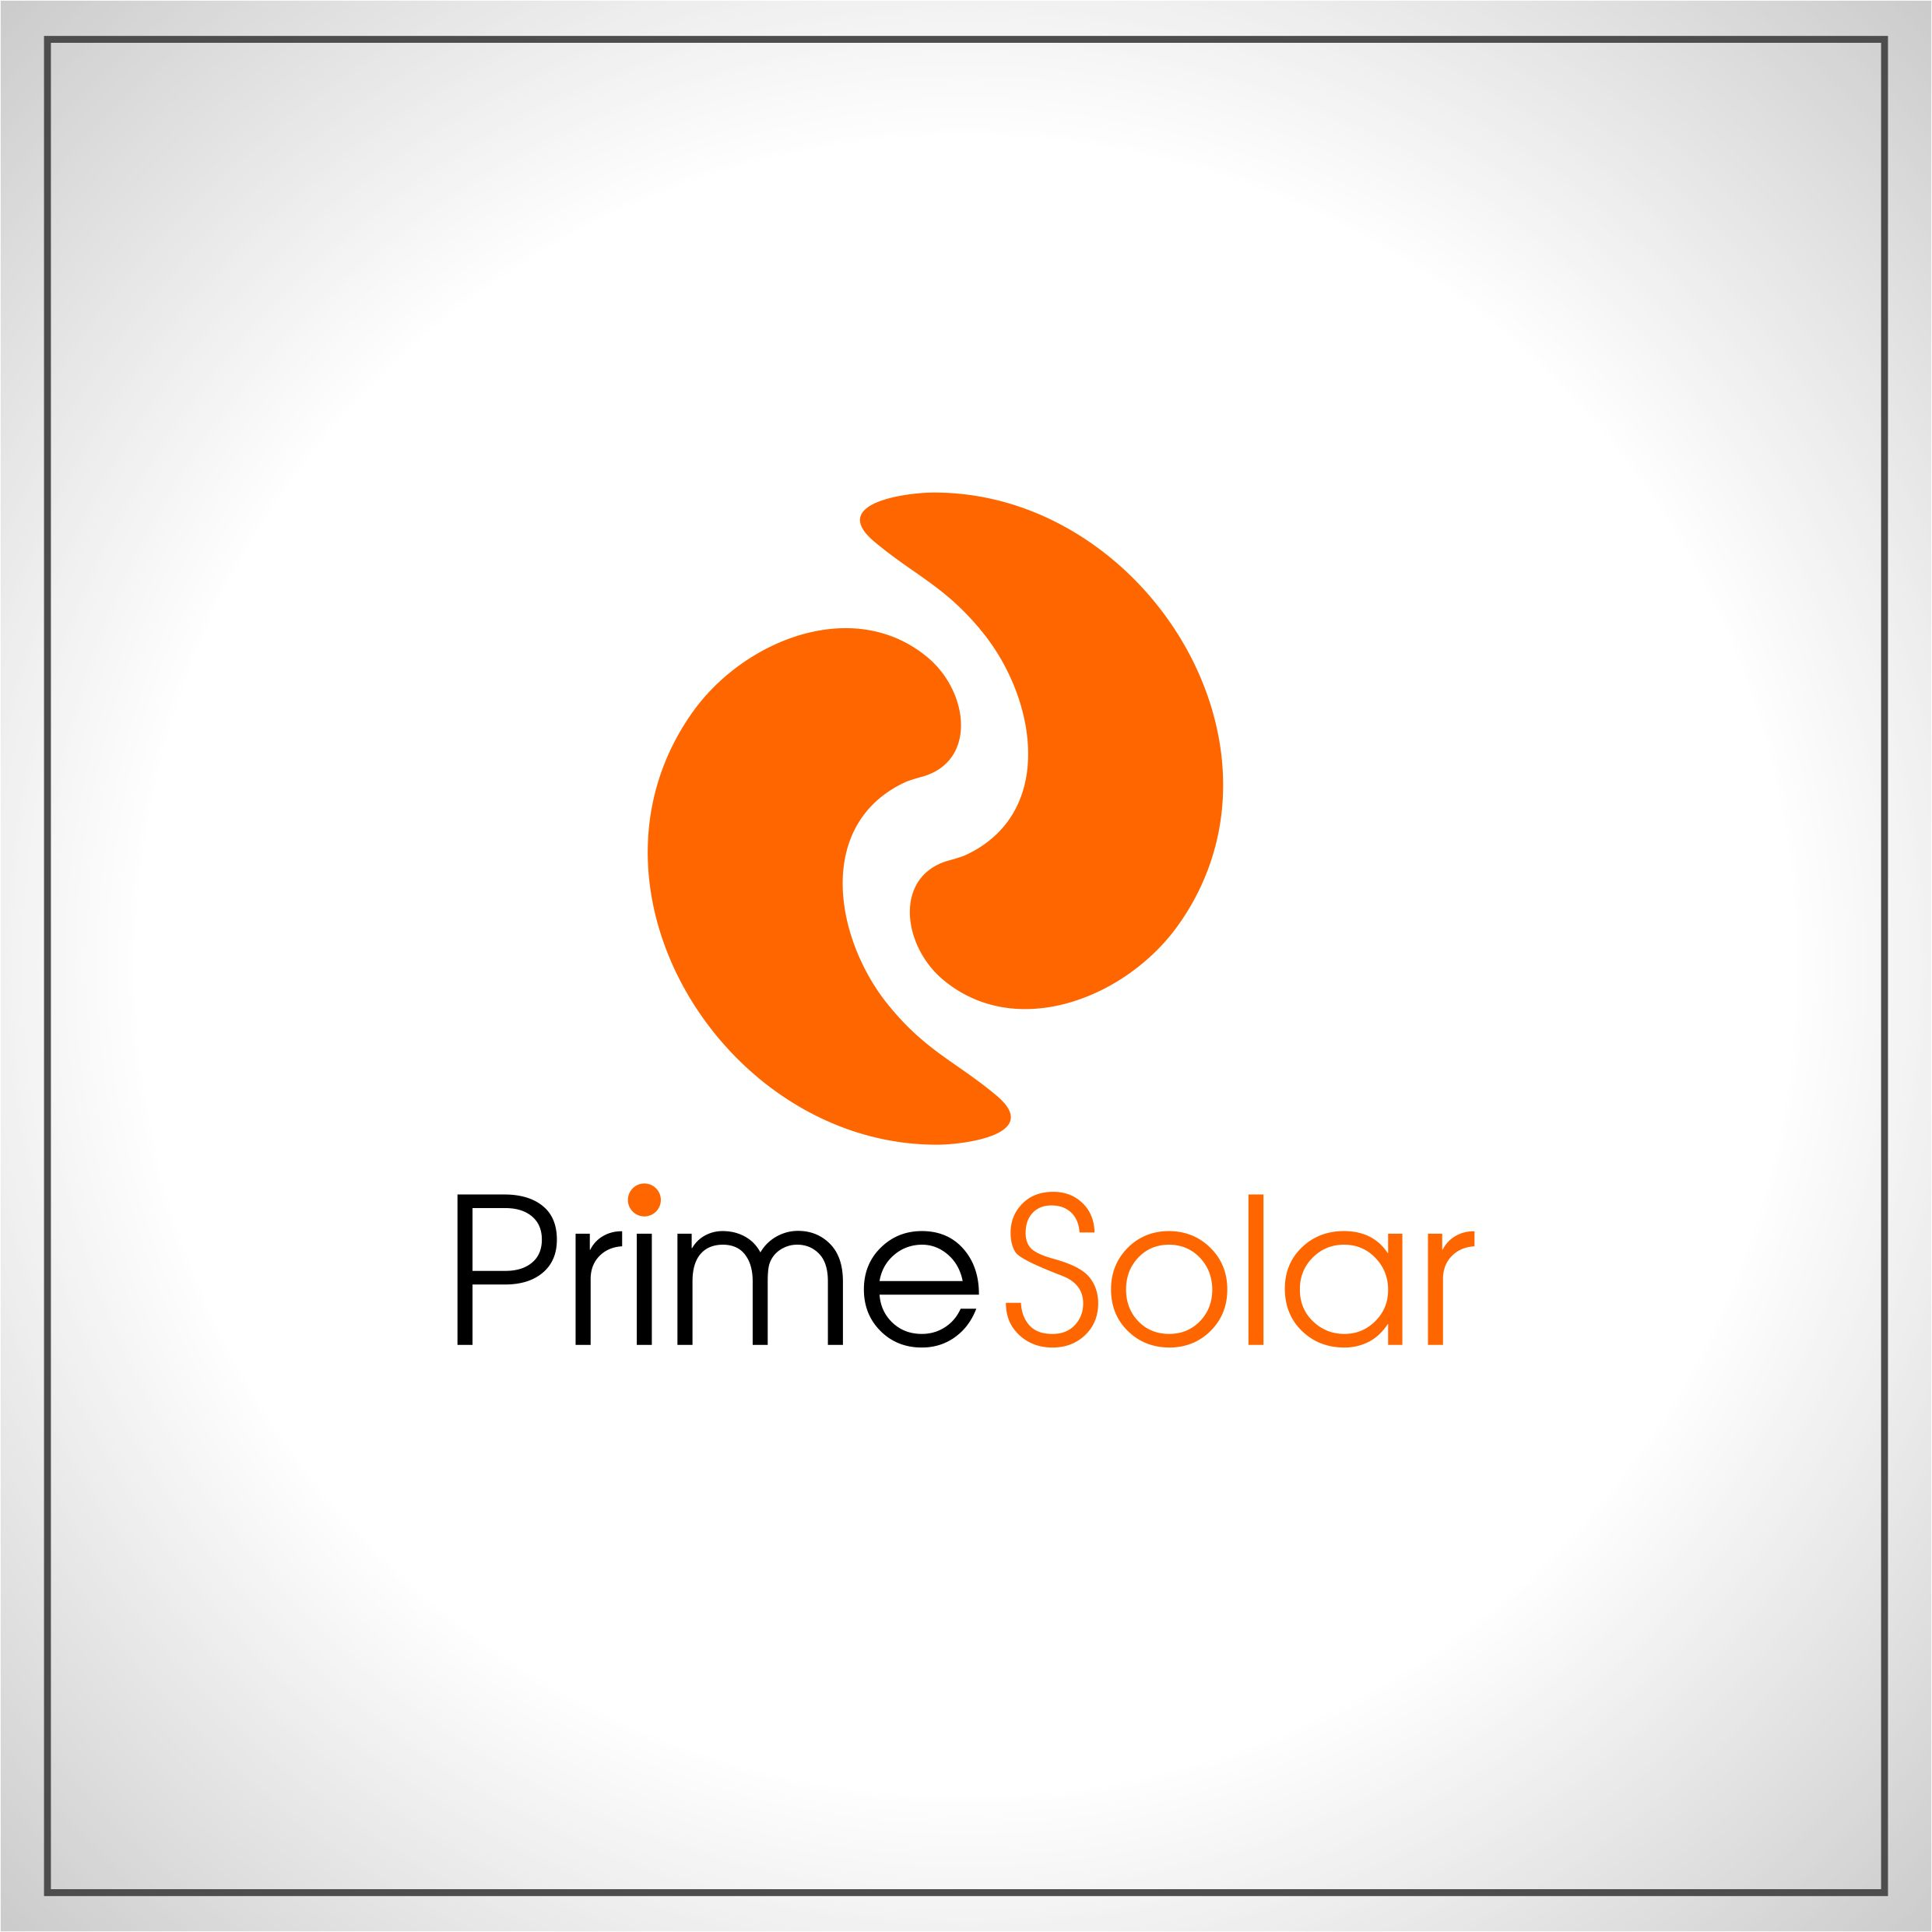 Логотип компании PrimeSolar [UPD: 16:45 15/12/11] фото f_4eef184470a3b.jpg